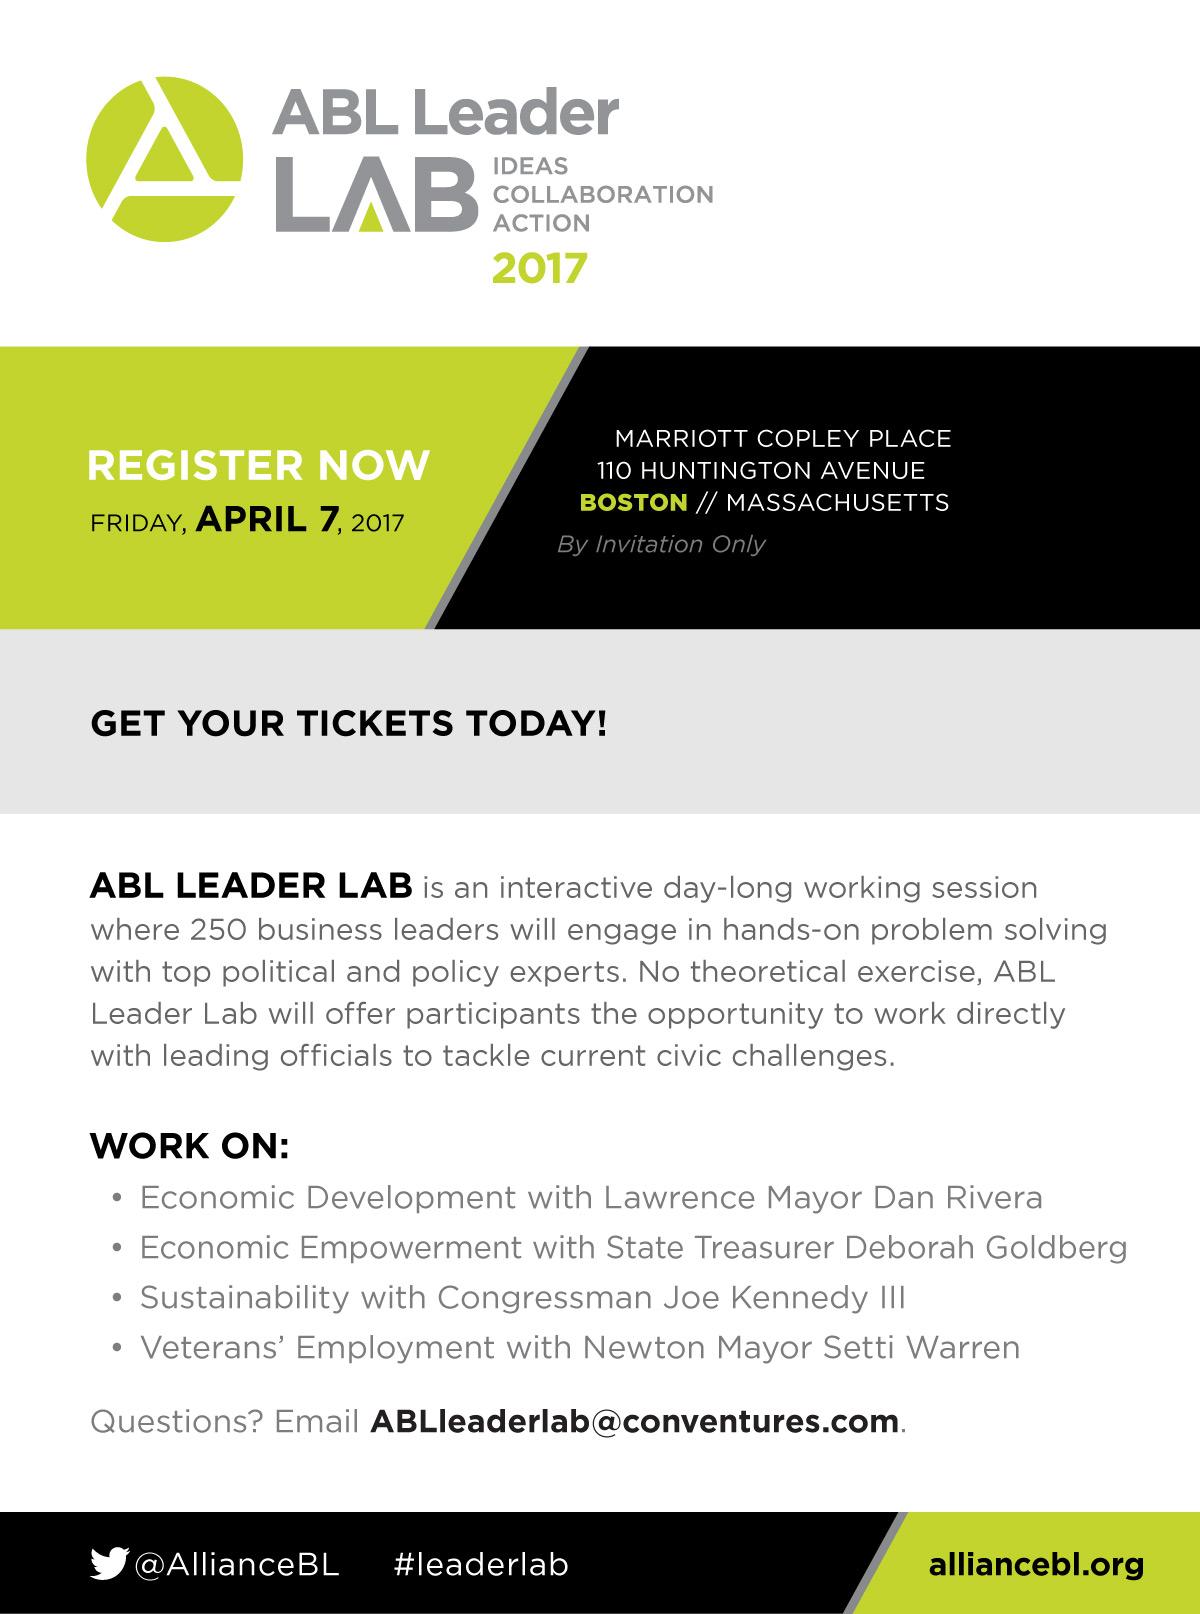 ABL Leader Lab 2017